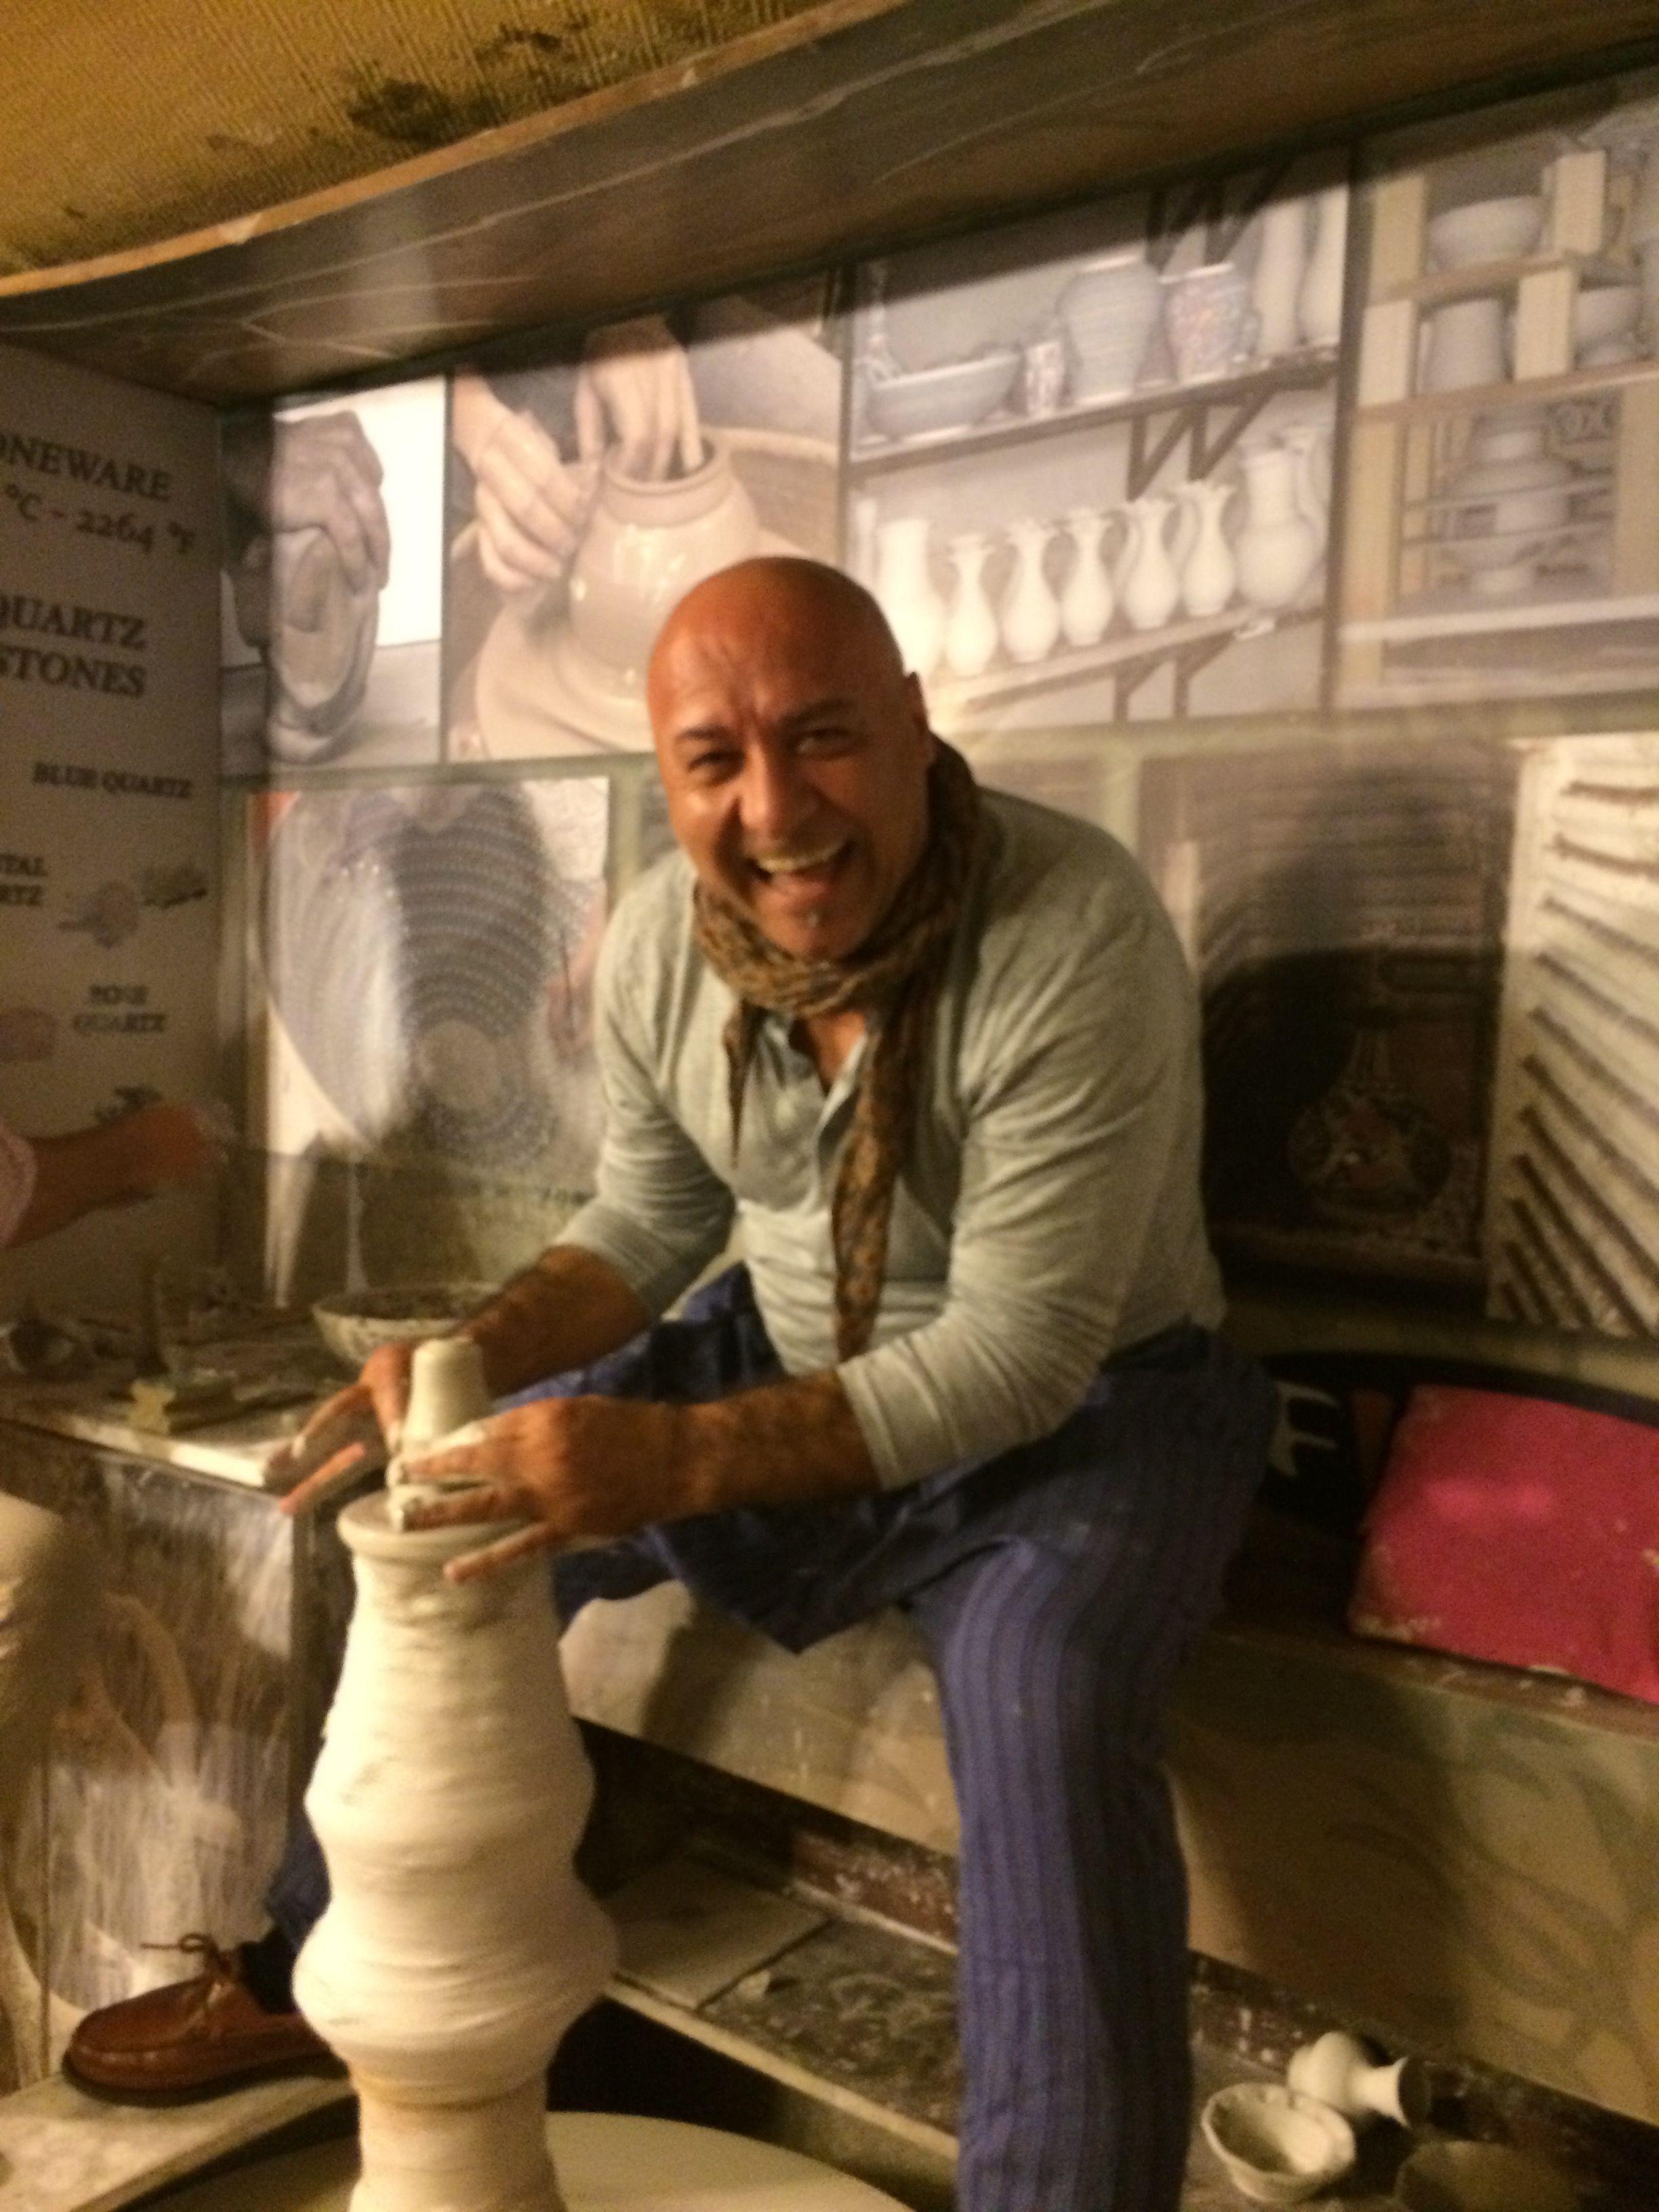 Trying my hand at ceramics! http://www.altiramisu.com/about-the-chef/ www.amyriolo.com #twochefsculinarycruise